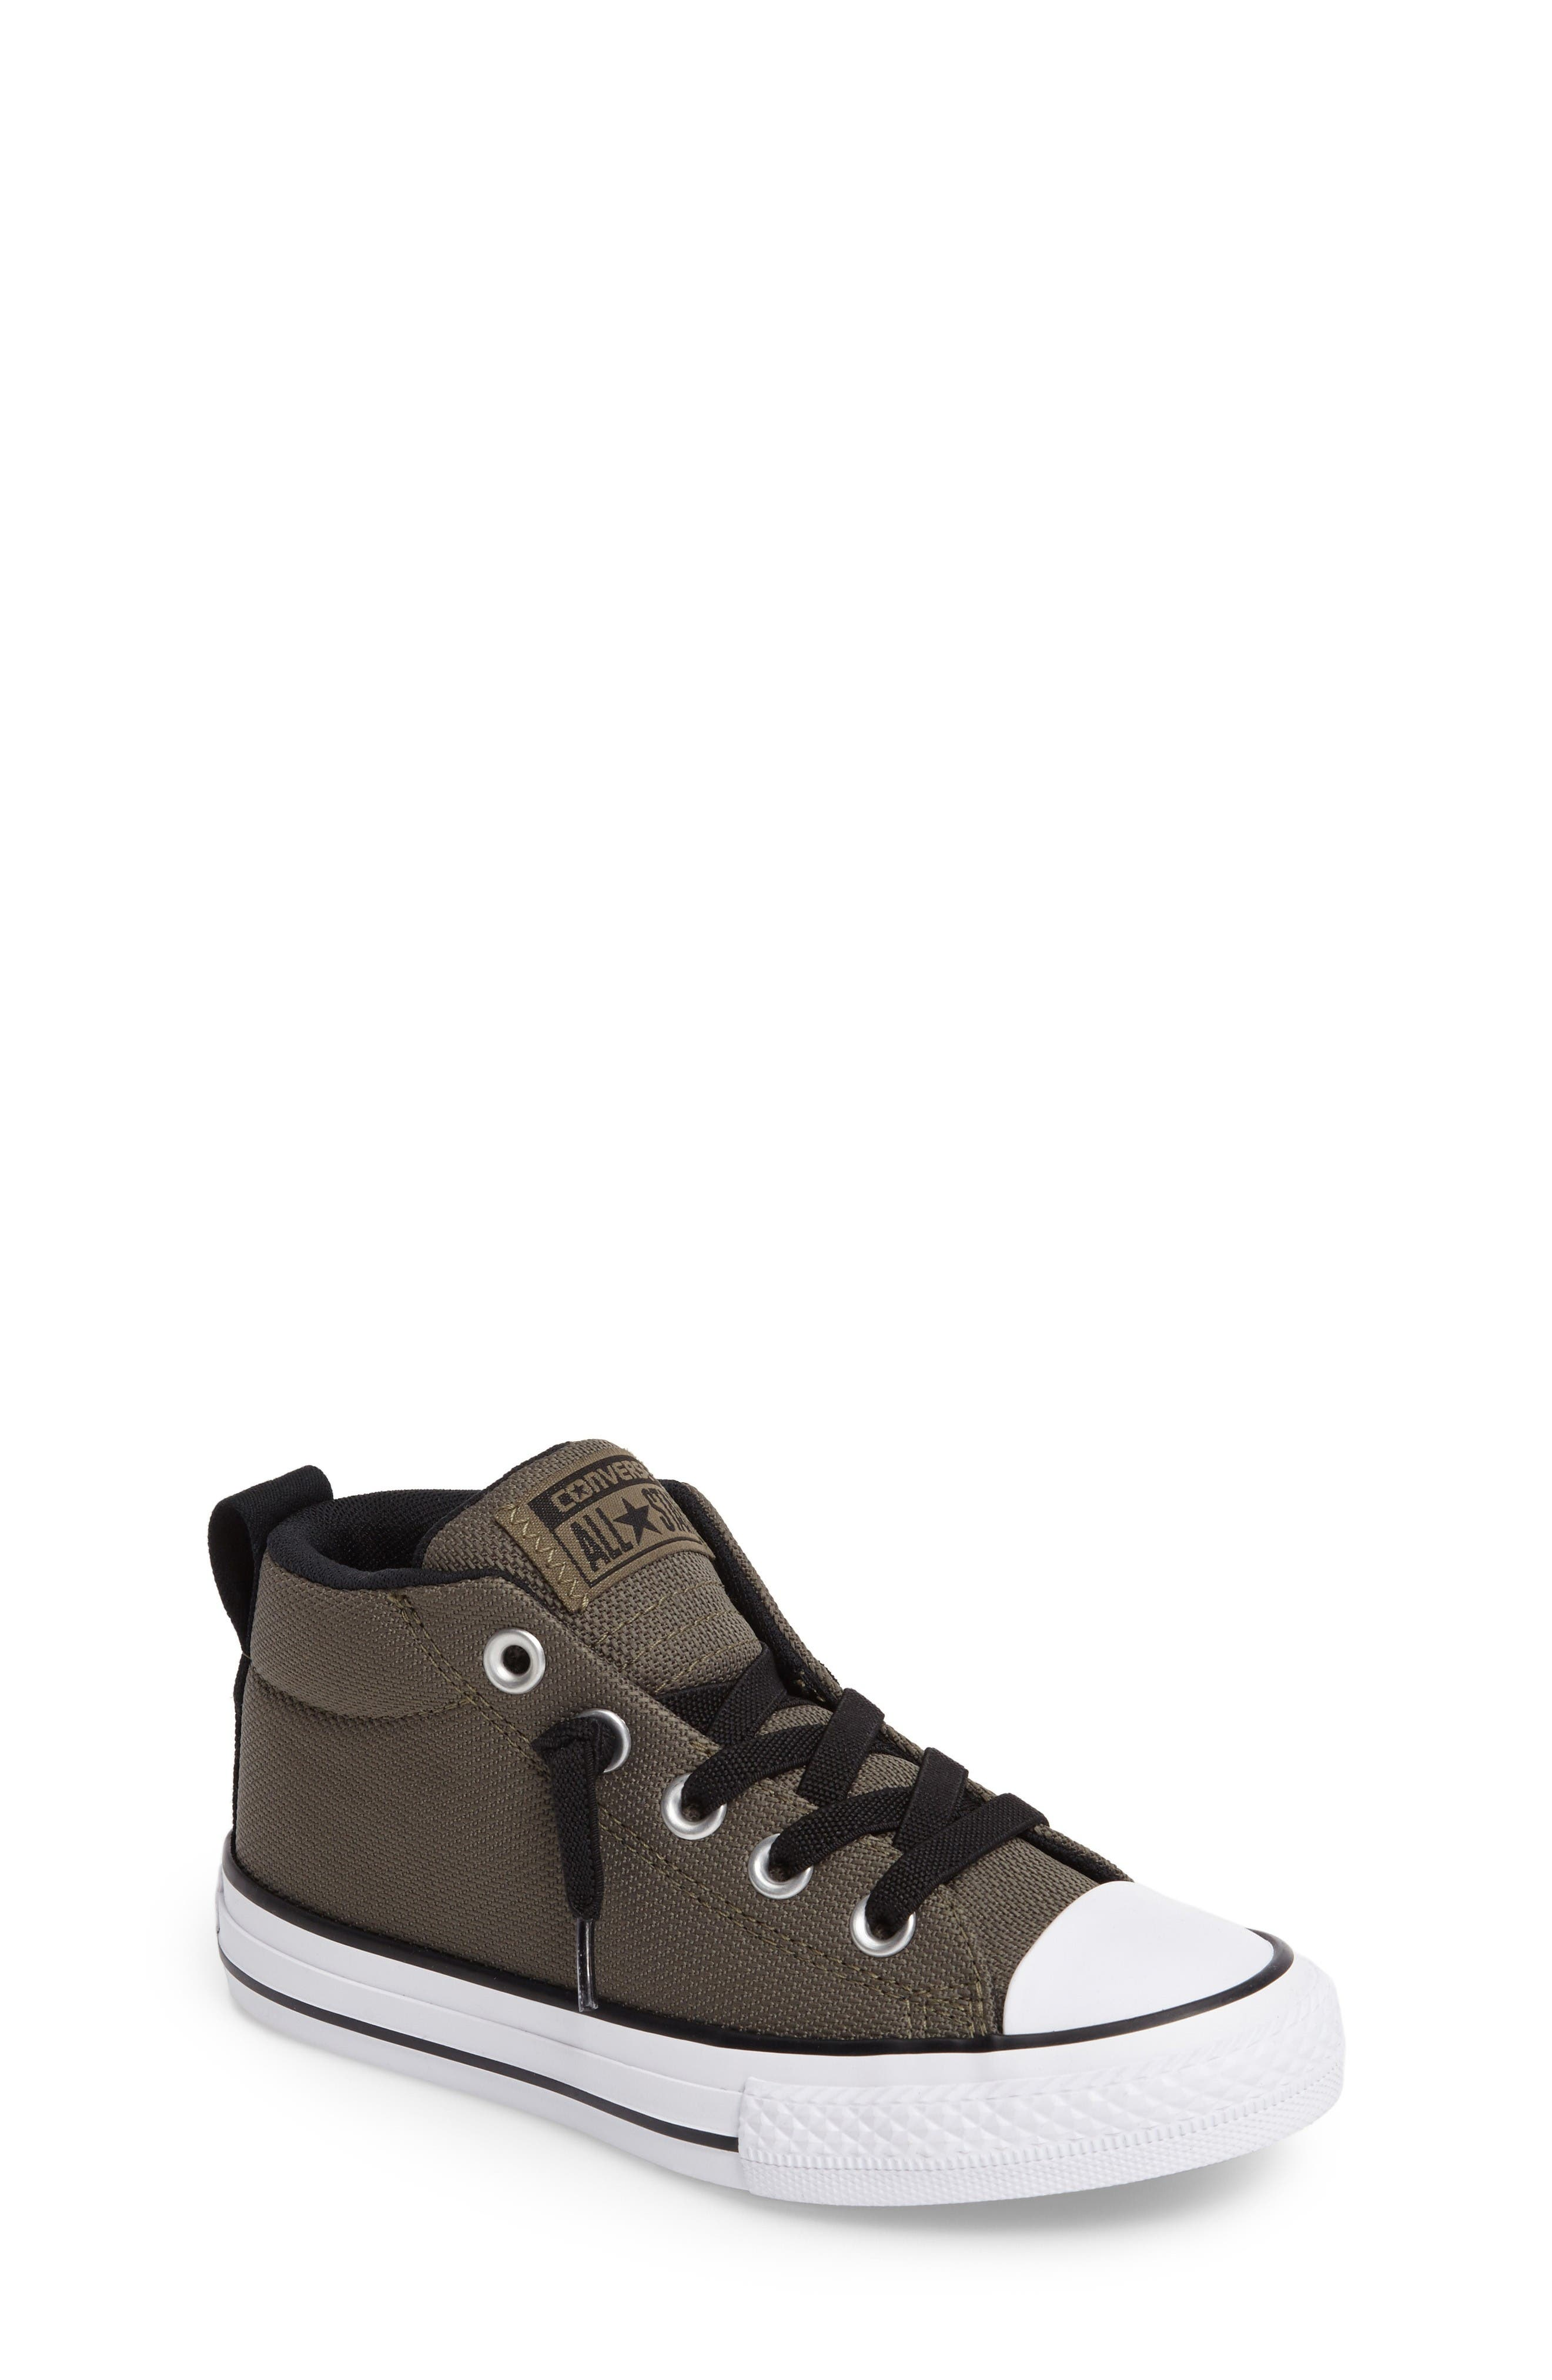 Main Image - Converse Chuck Taylor® All Star® Basket Weave Street Mid Sneaker (Toddler, Little Kid & Big Kid)